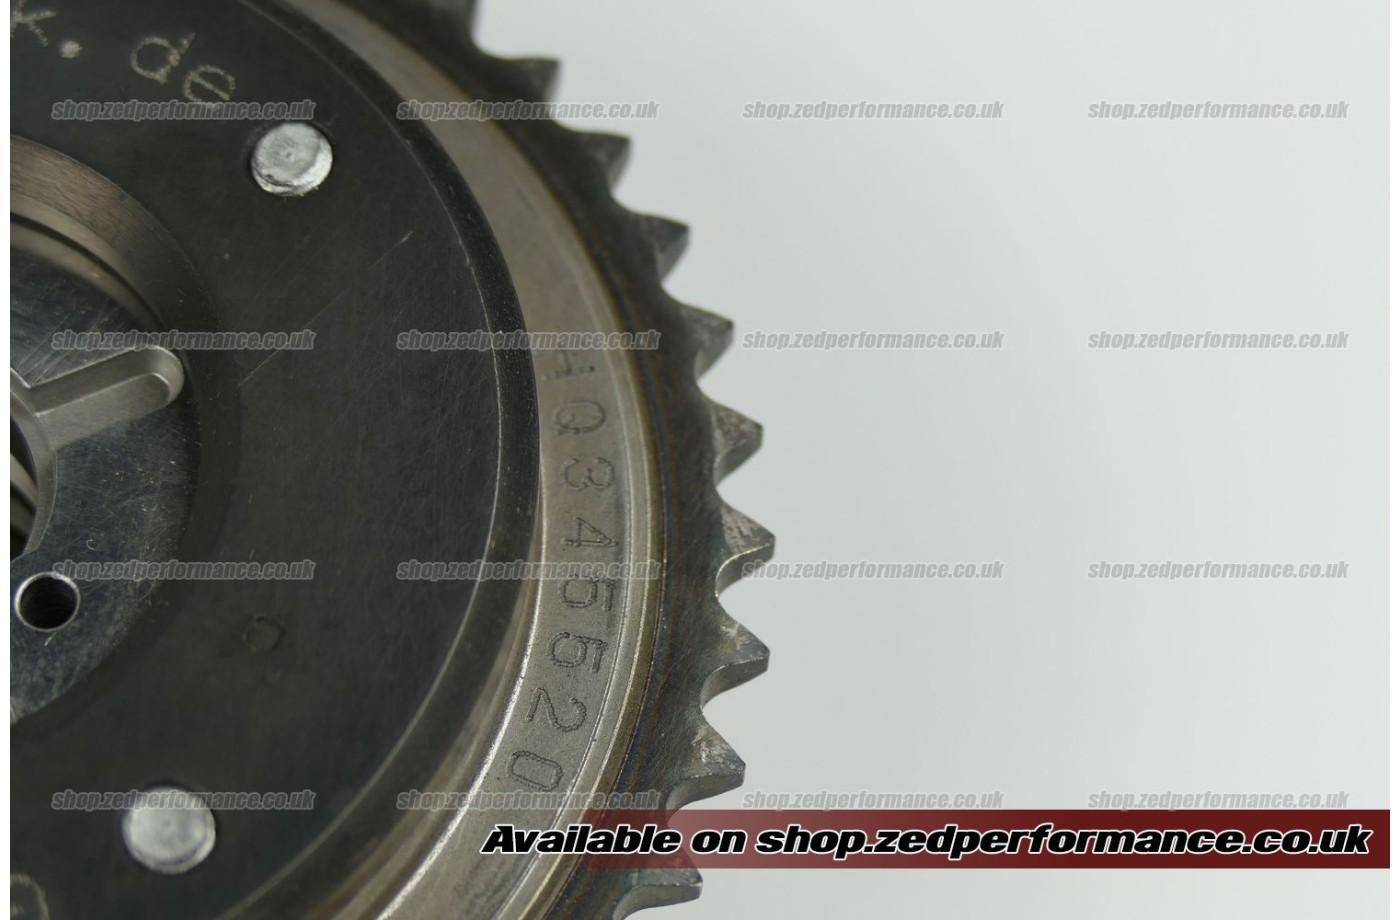 Mercedes M271 Kompressor C180 timing gears camshaft adjuster vanos hub